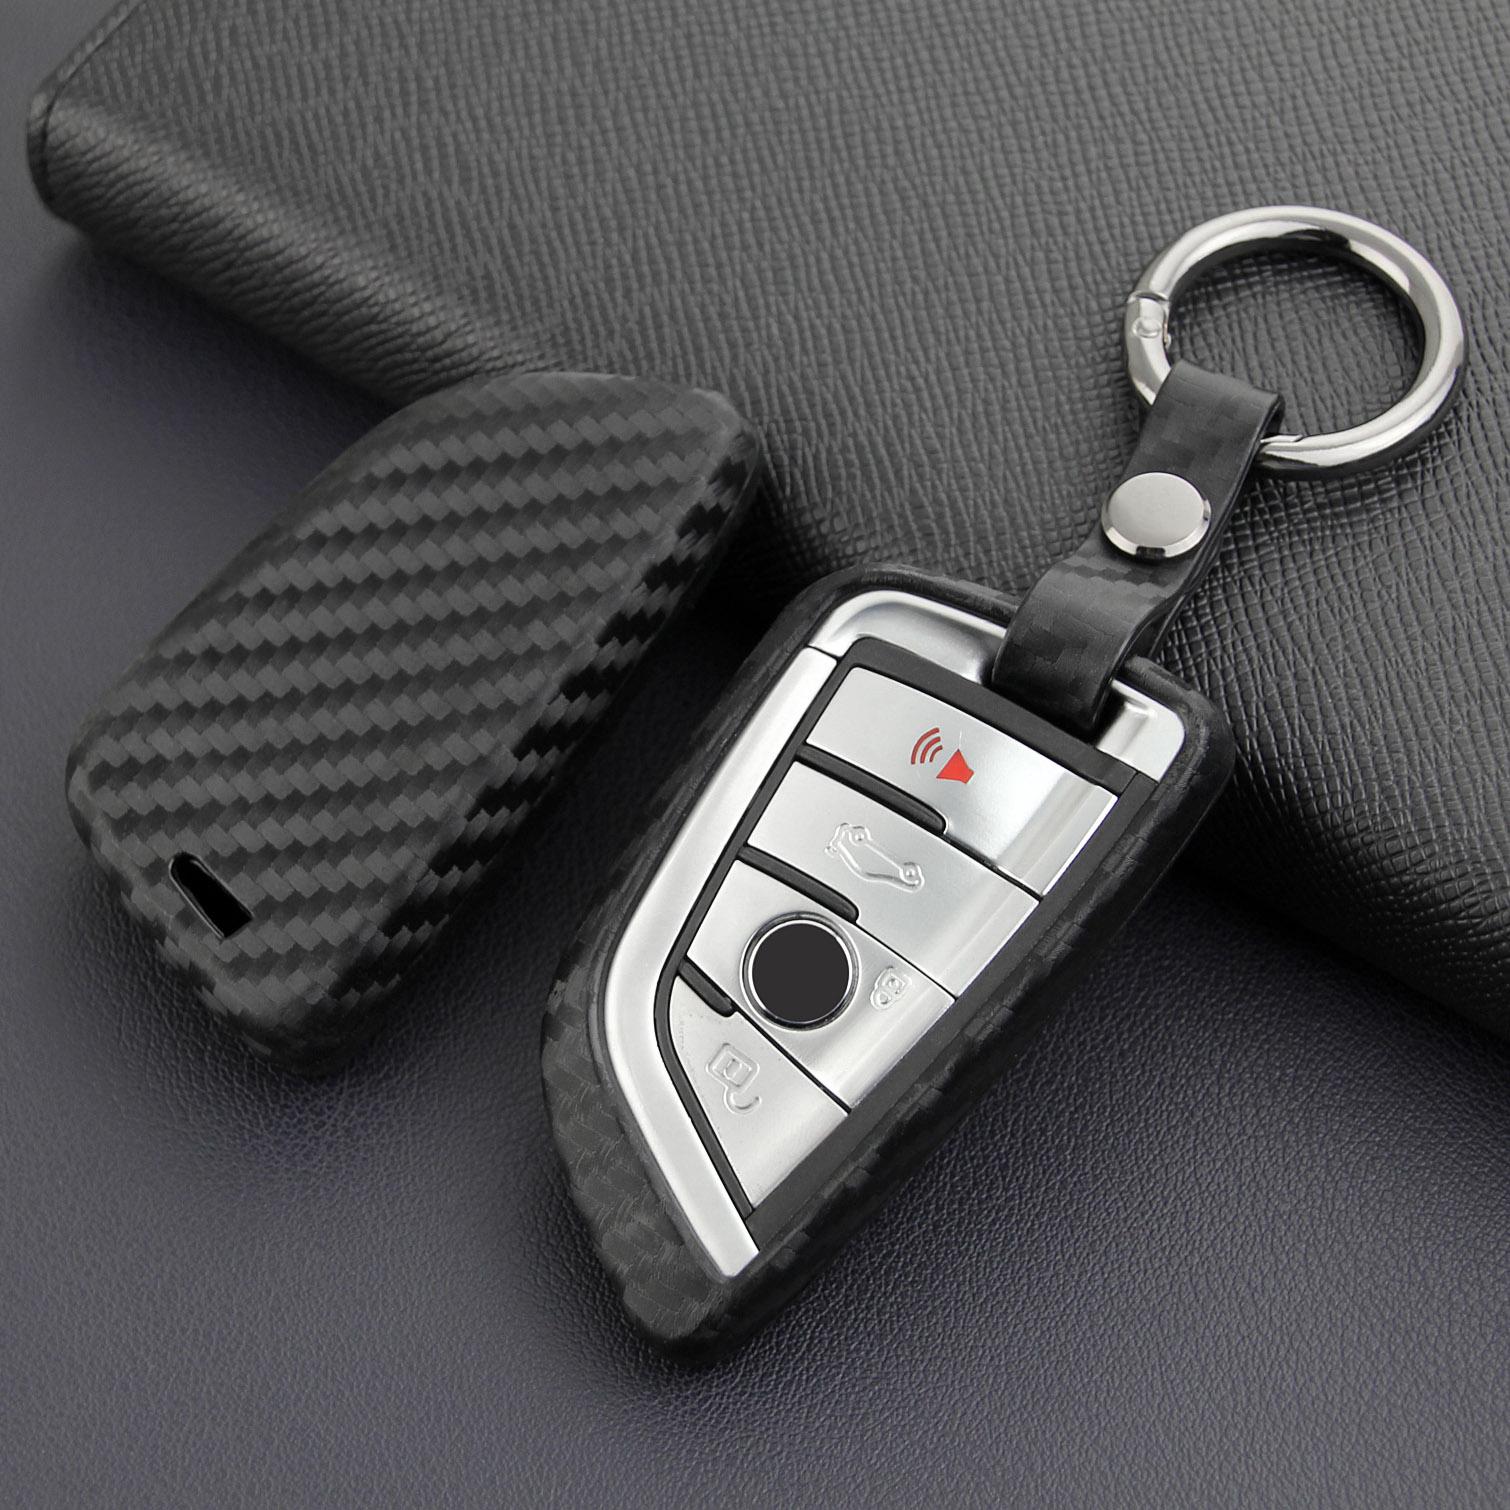 Carbon Fiber Look Car Key Case Cover Keychain Fob For BMW 5 6 7 Series GT M5 X1 X3 X5 X6 F45 G30 G32 G11 F90 F48 G01 F15 F16